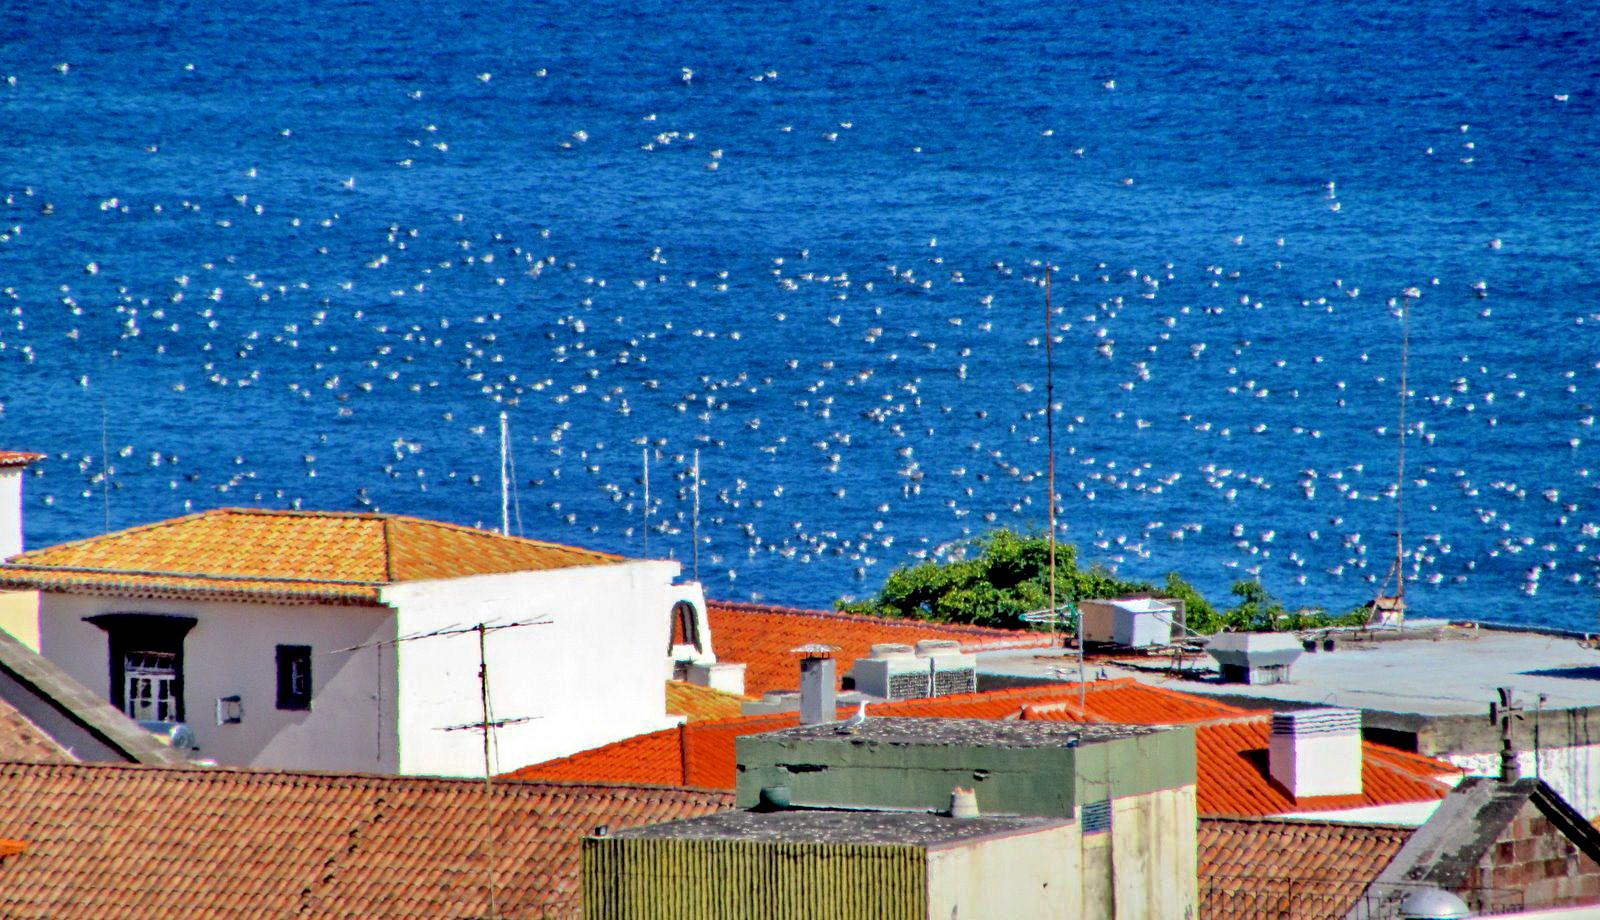 seagulls, seagulls and more seagulls